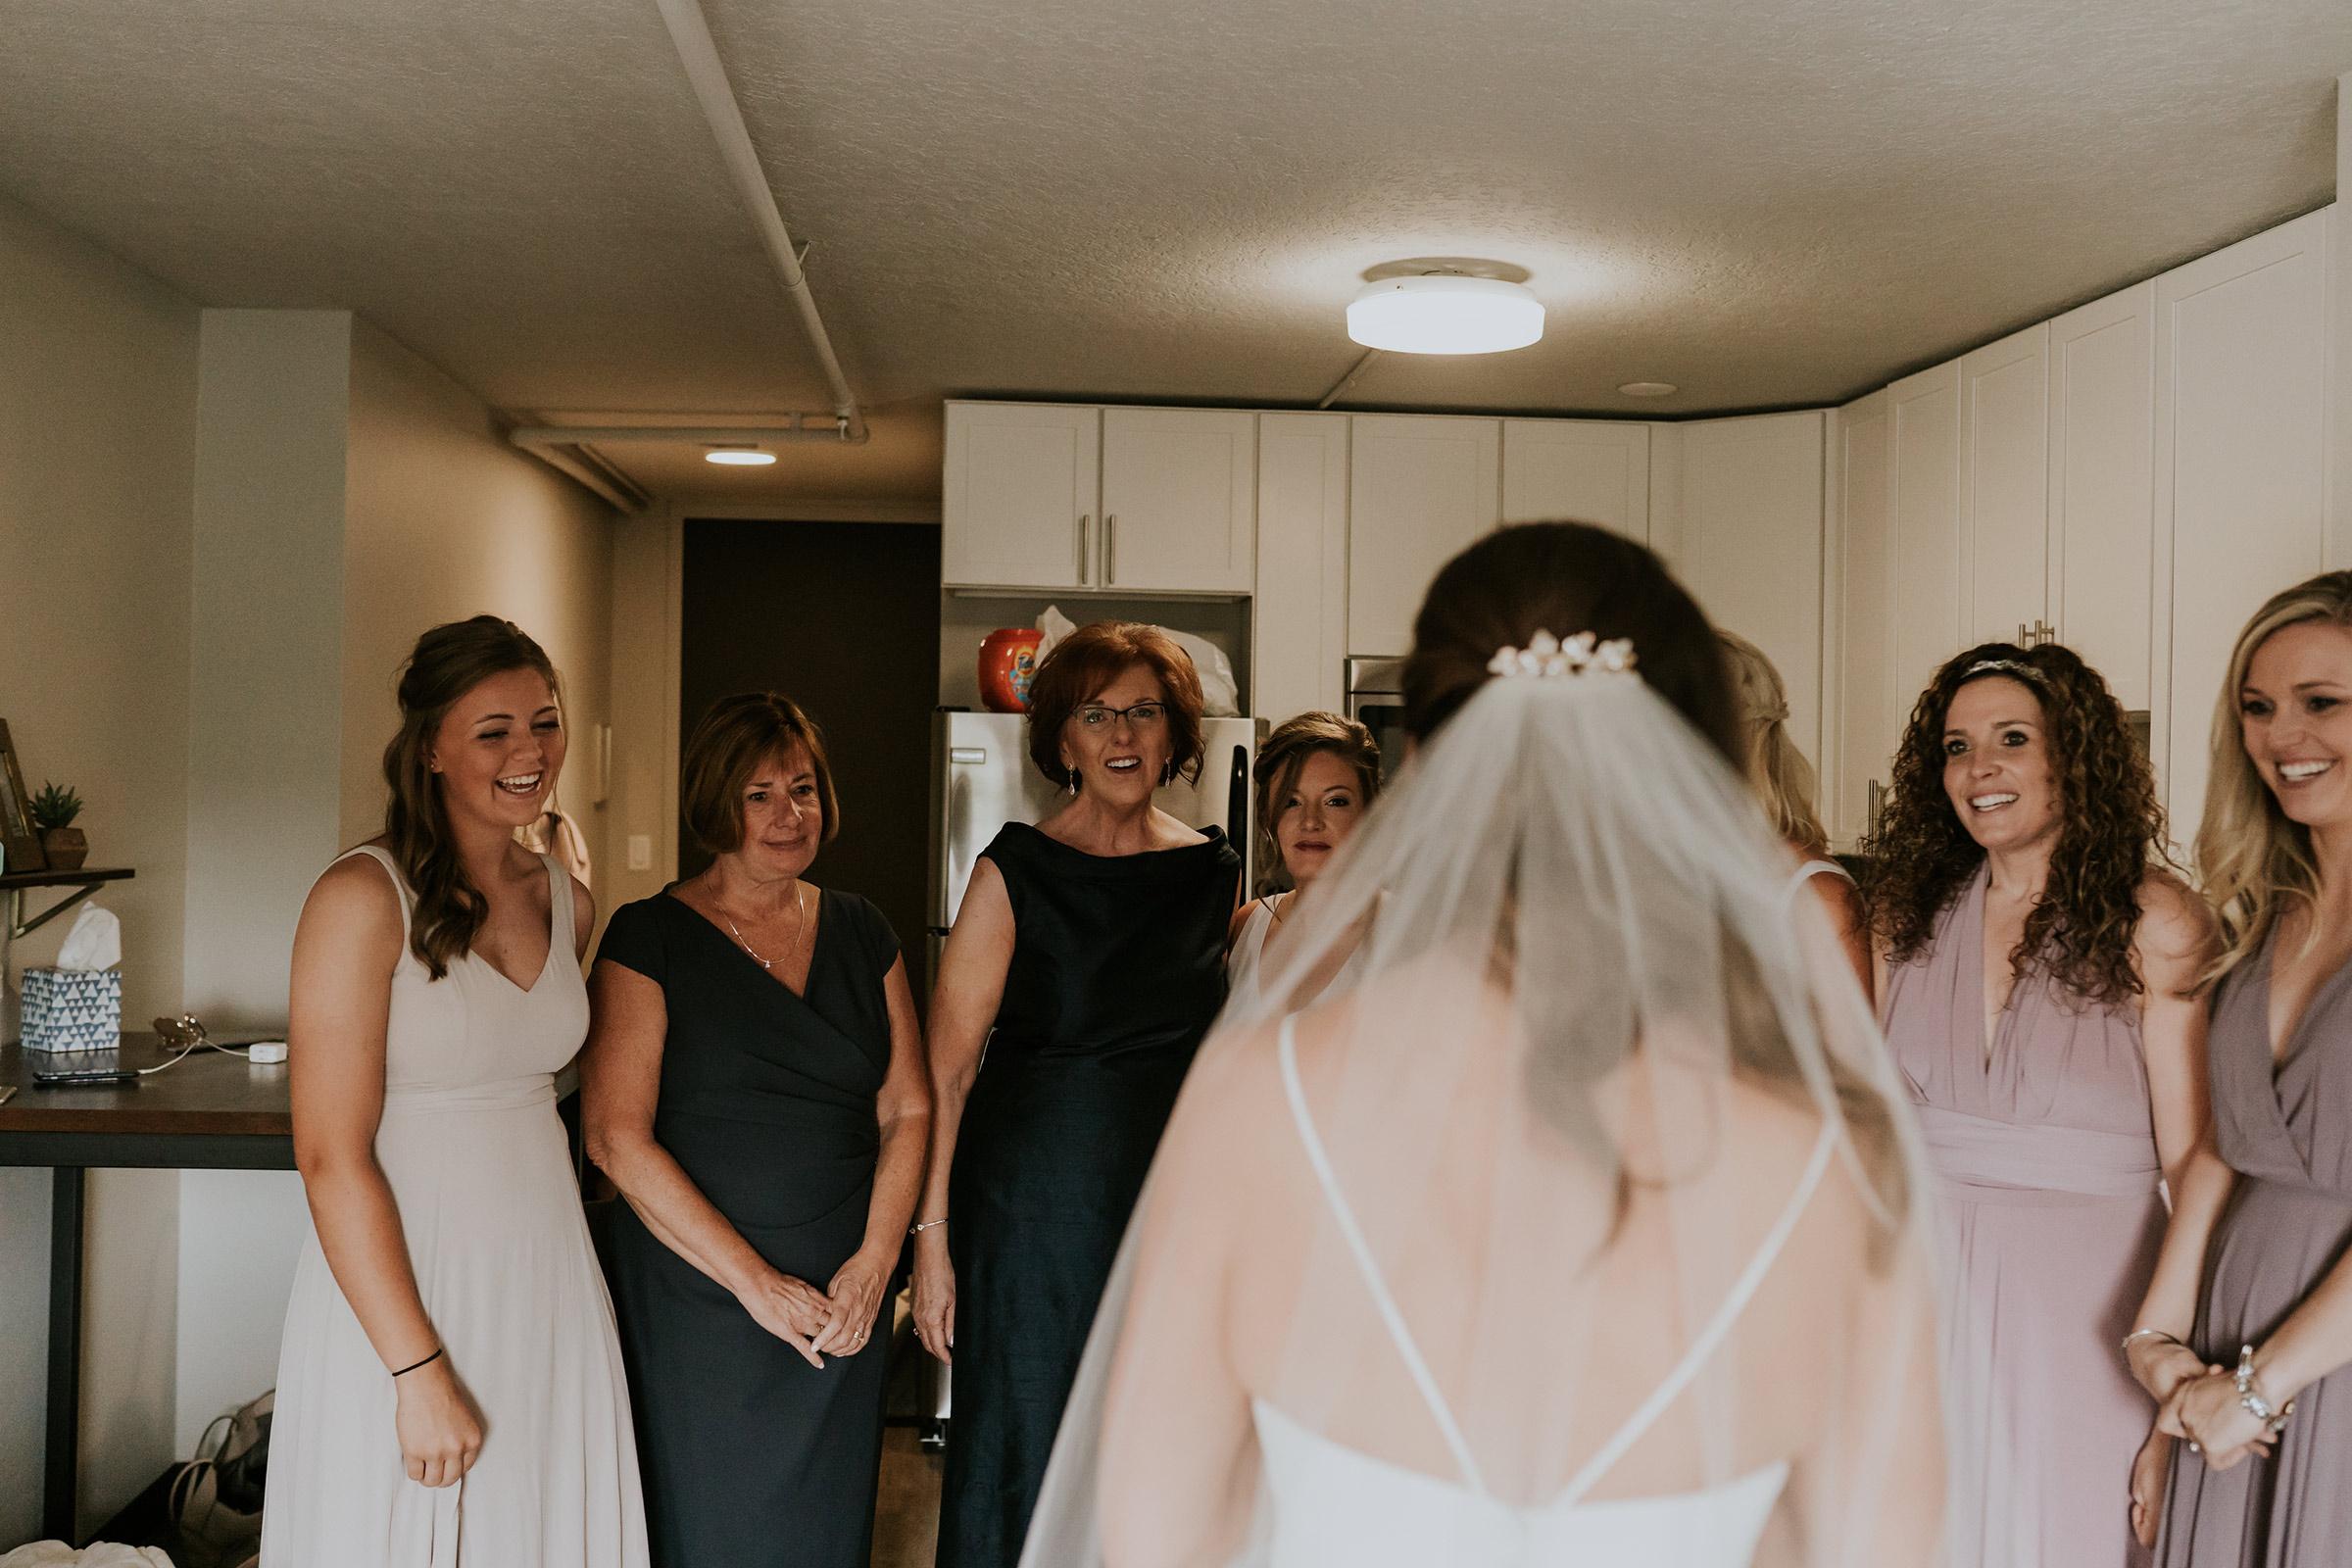 mr-mrs-hull-bride-showing-off-dress-desmoines-iowa-raelyn-ramey-photography-71.jpg